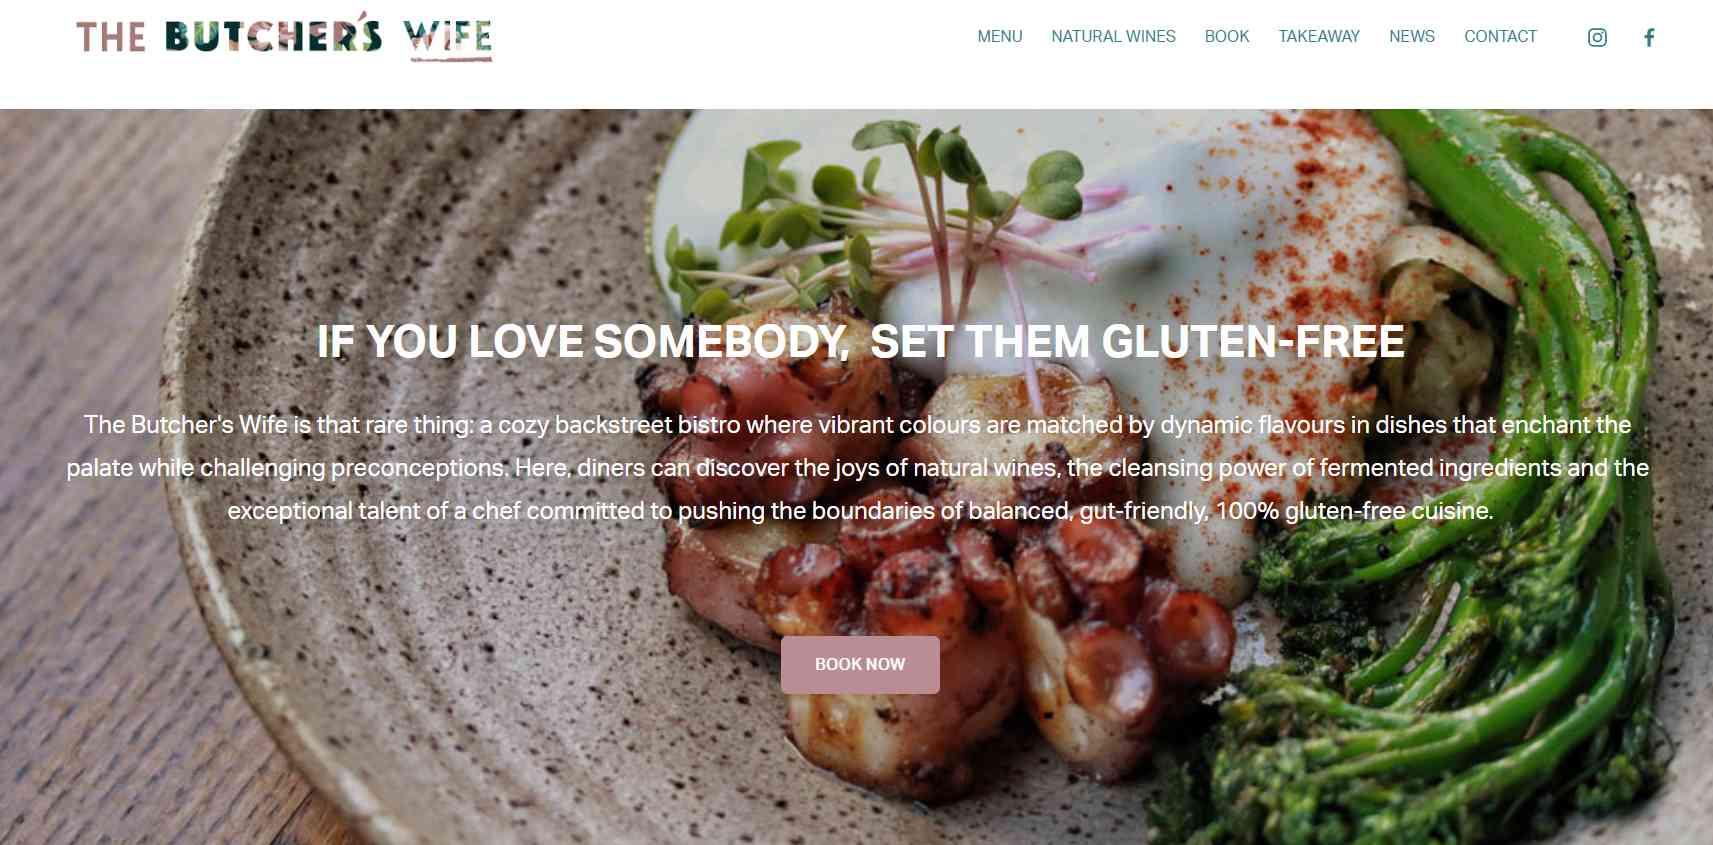 the butchers wife Top Mediterranean Restaurants in Singapore